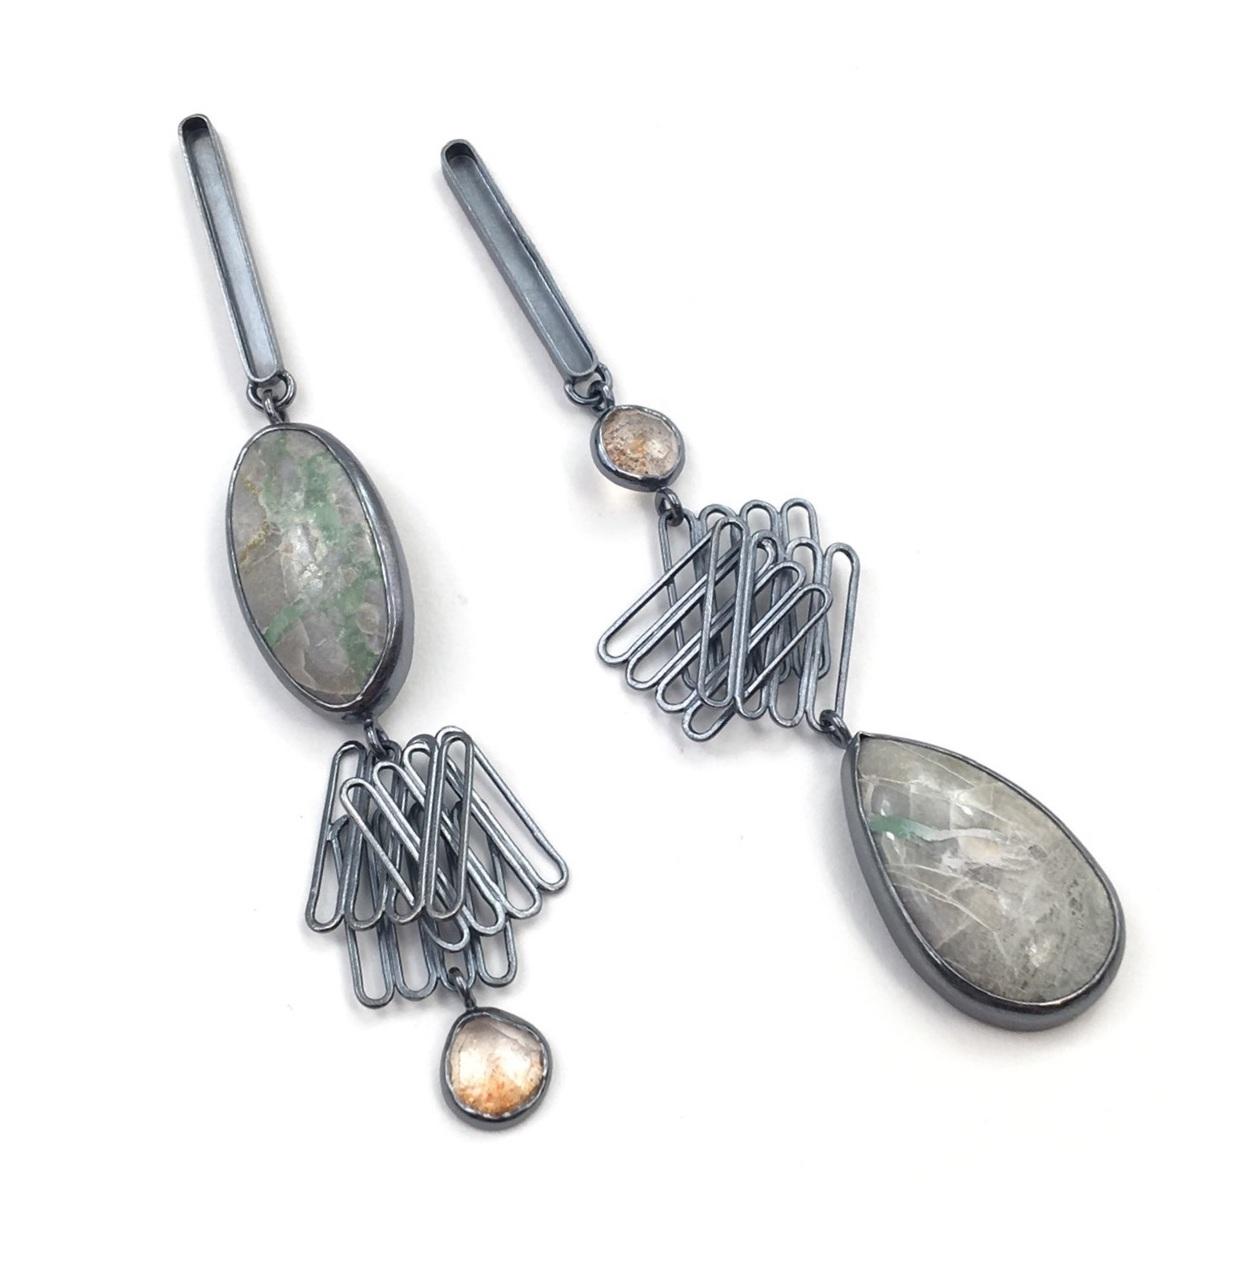 QUAD STACK EARRINGS  Oxidized sterling silver, variscite, sunstone